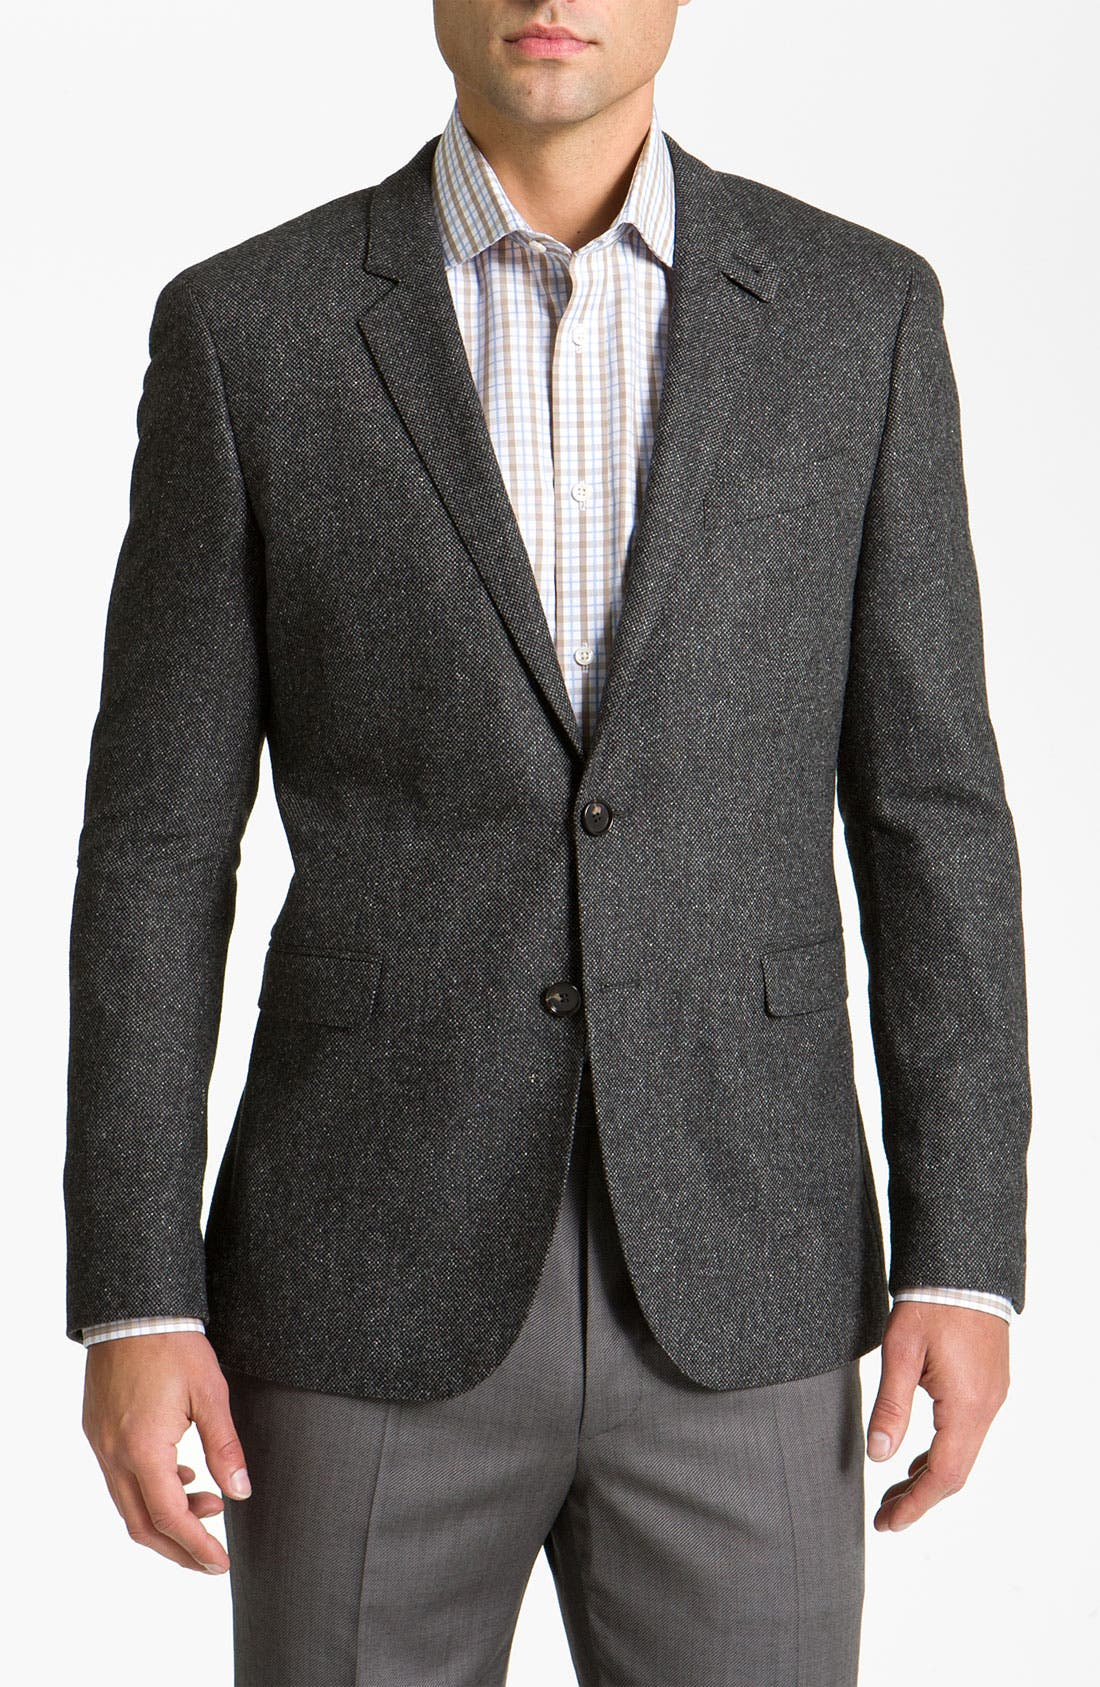 Main Image - BOSS Black 'Rhett' Extra Trim Fit Tweed Sportcoat